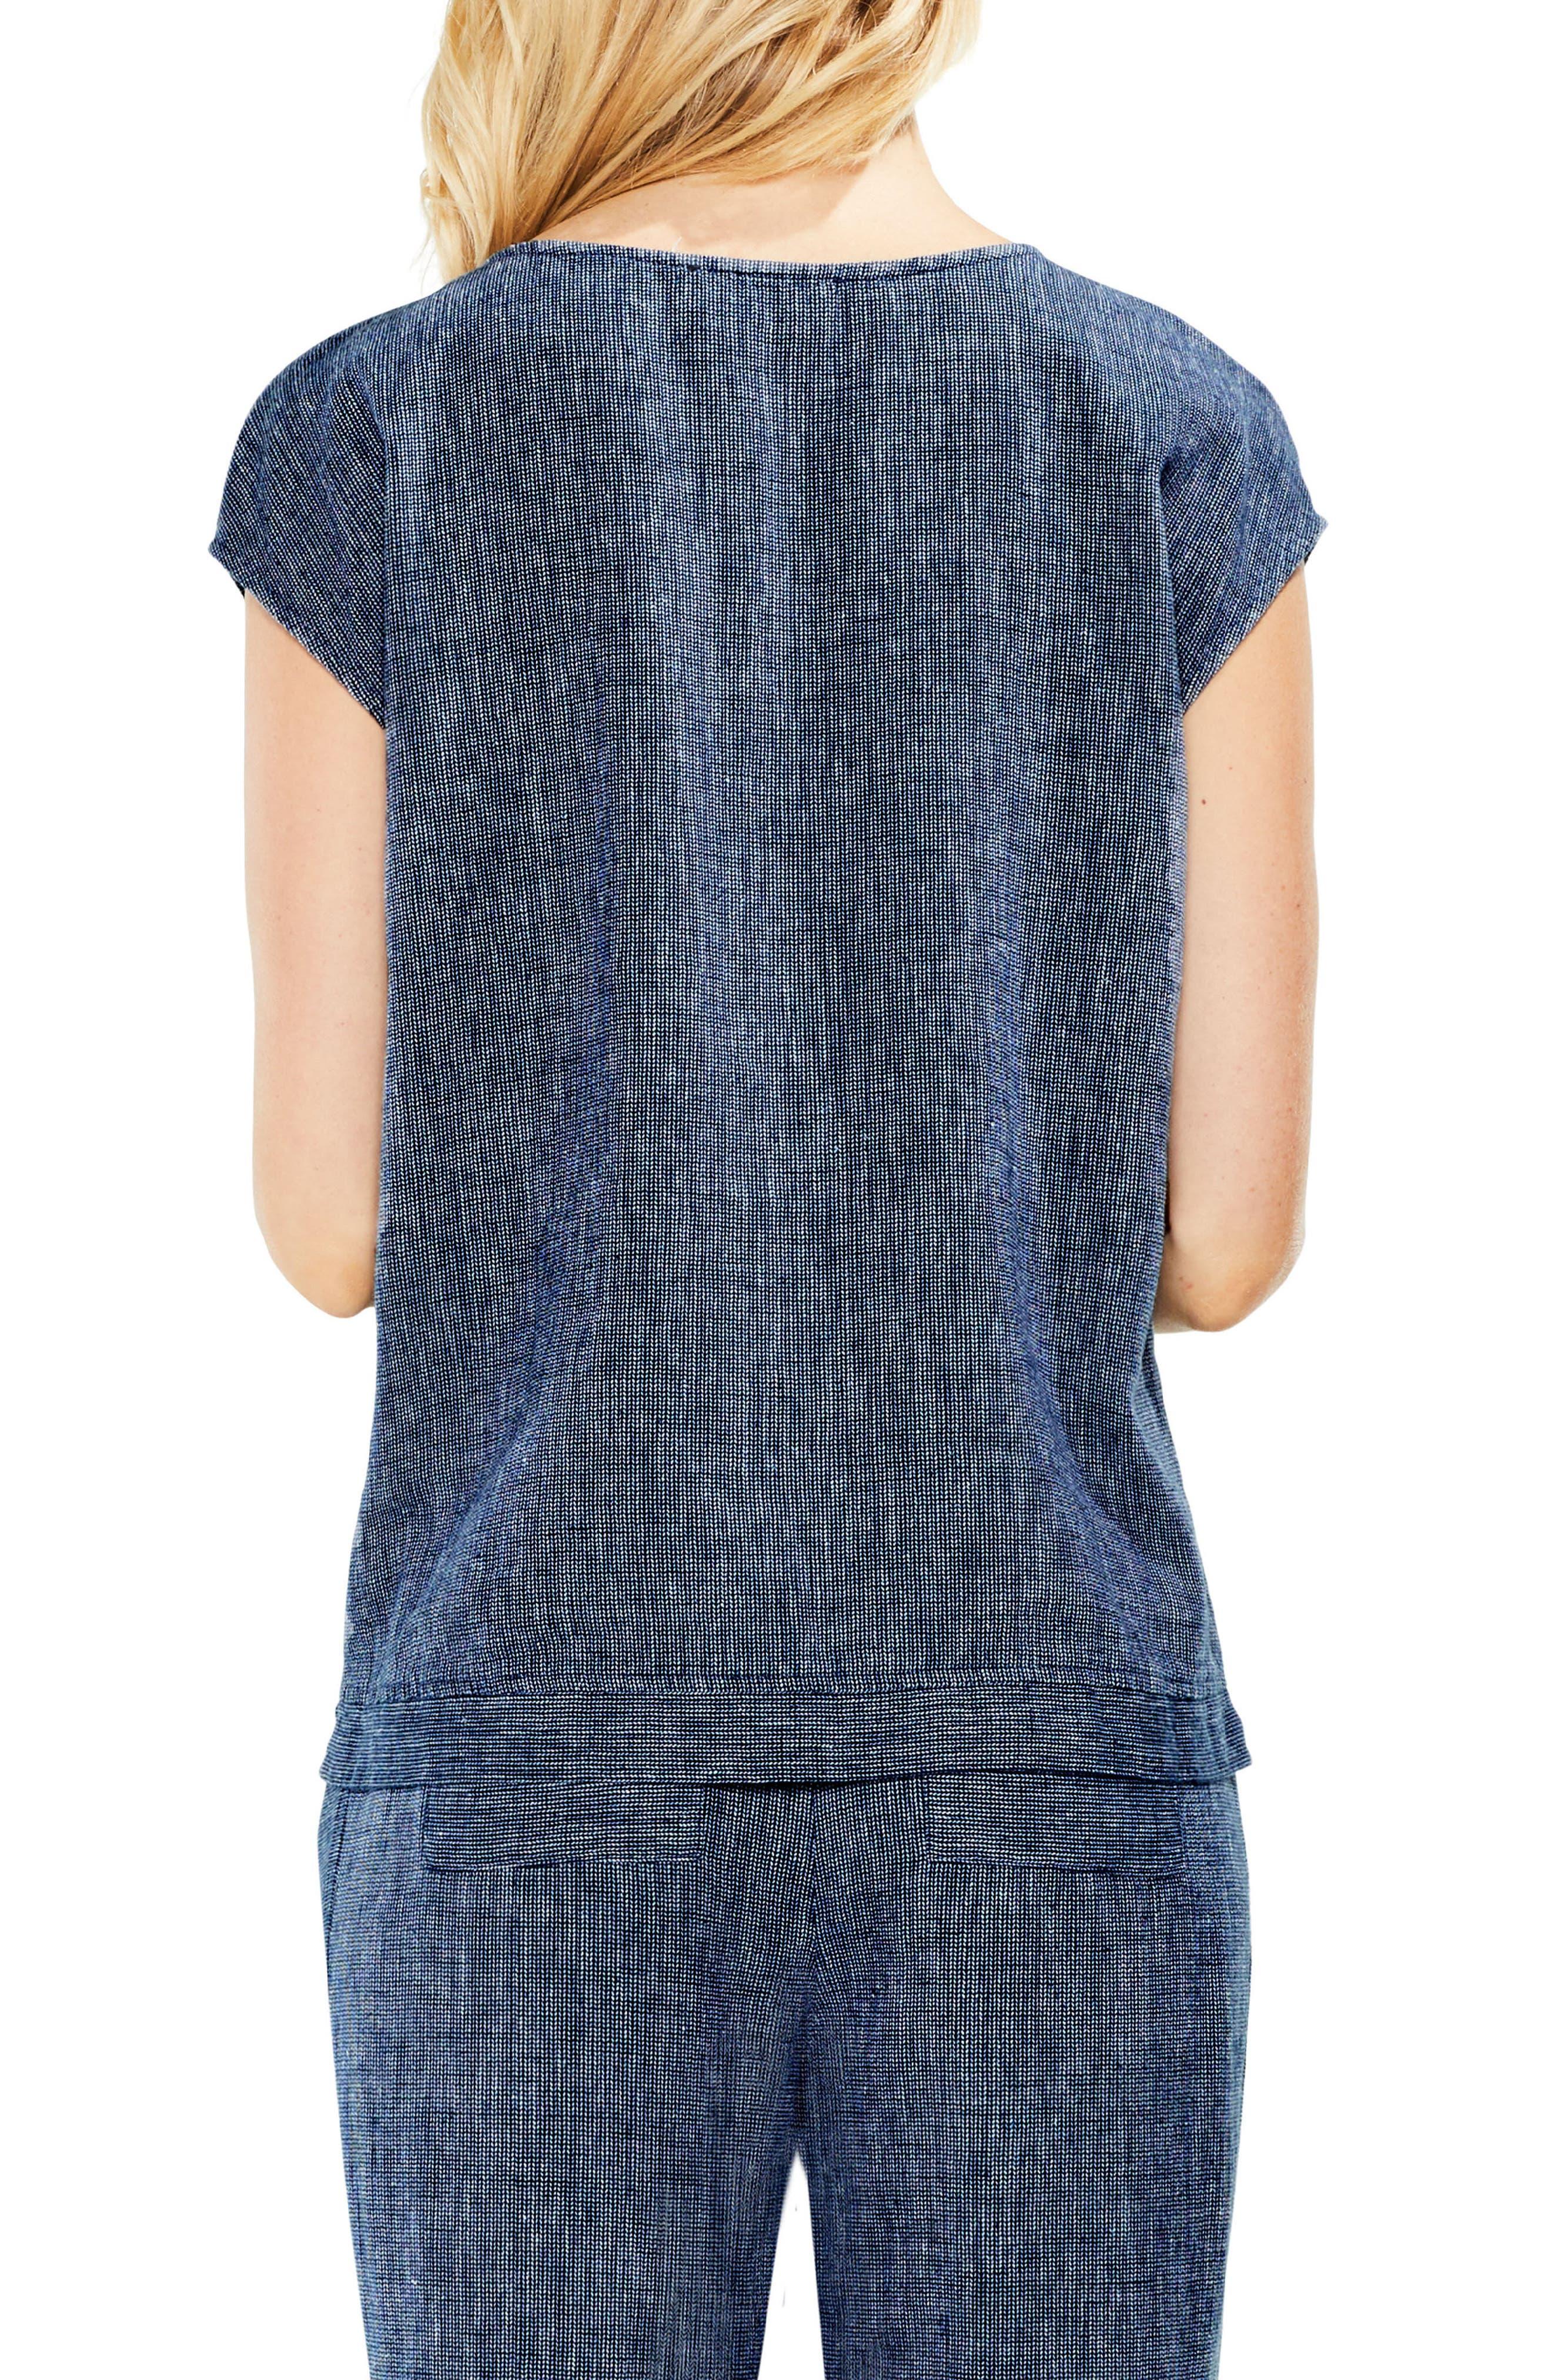 Drop Shoulder Linen Top,                             Alternate thumbnail 2, color,                             462